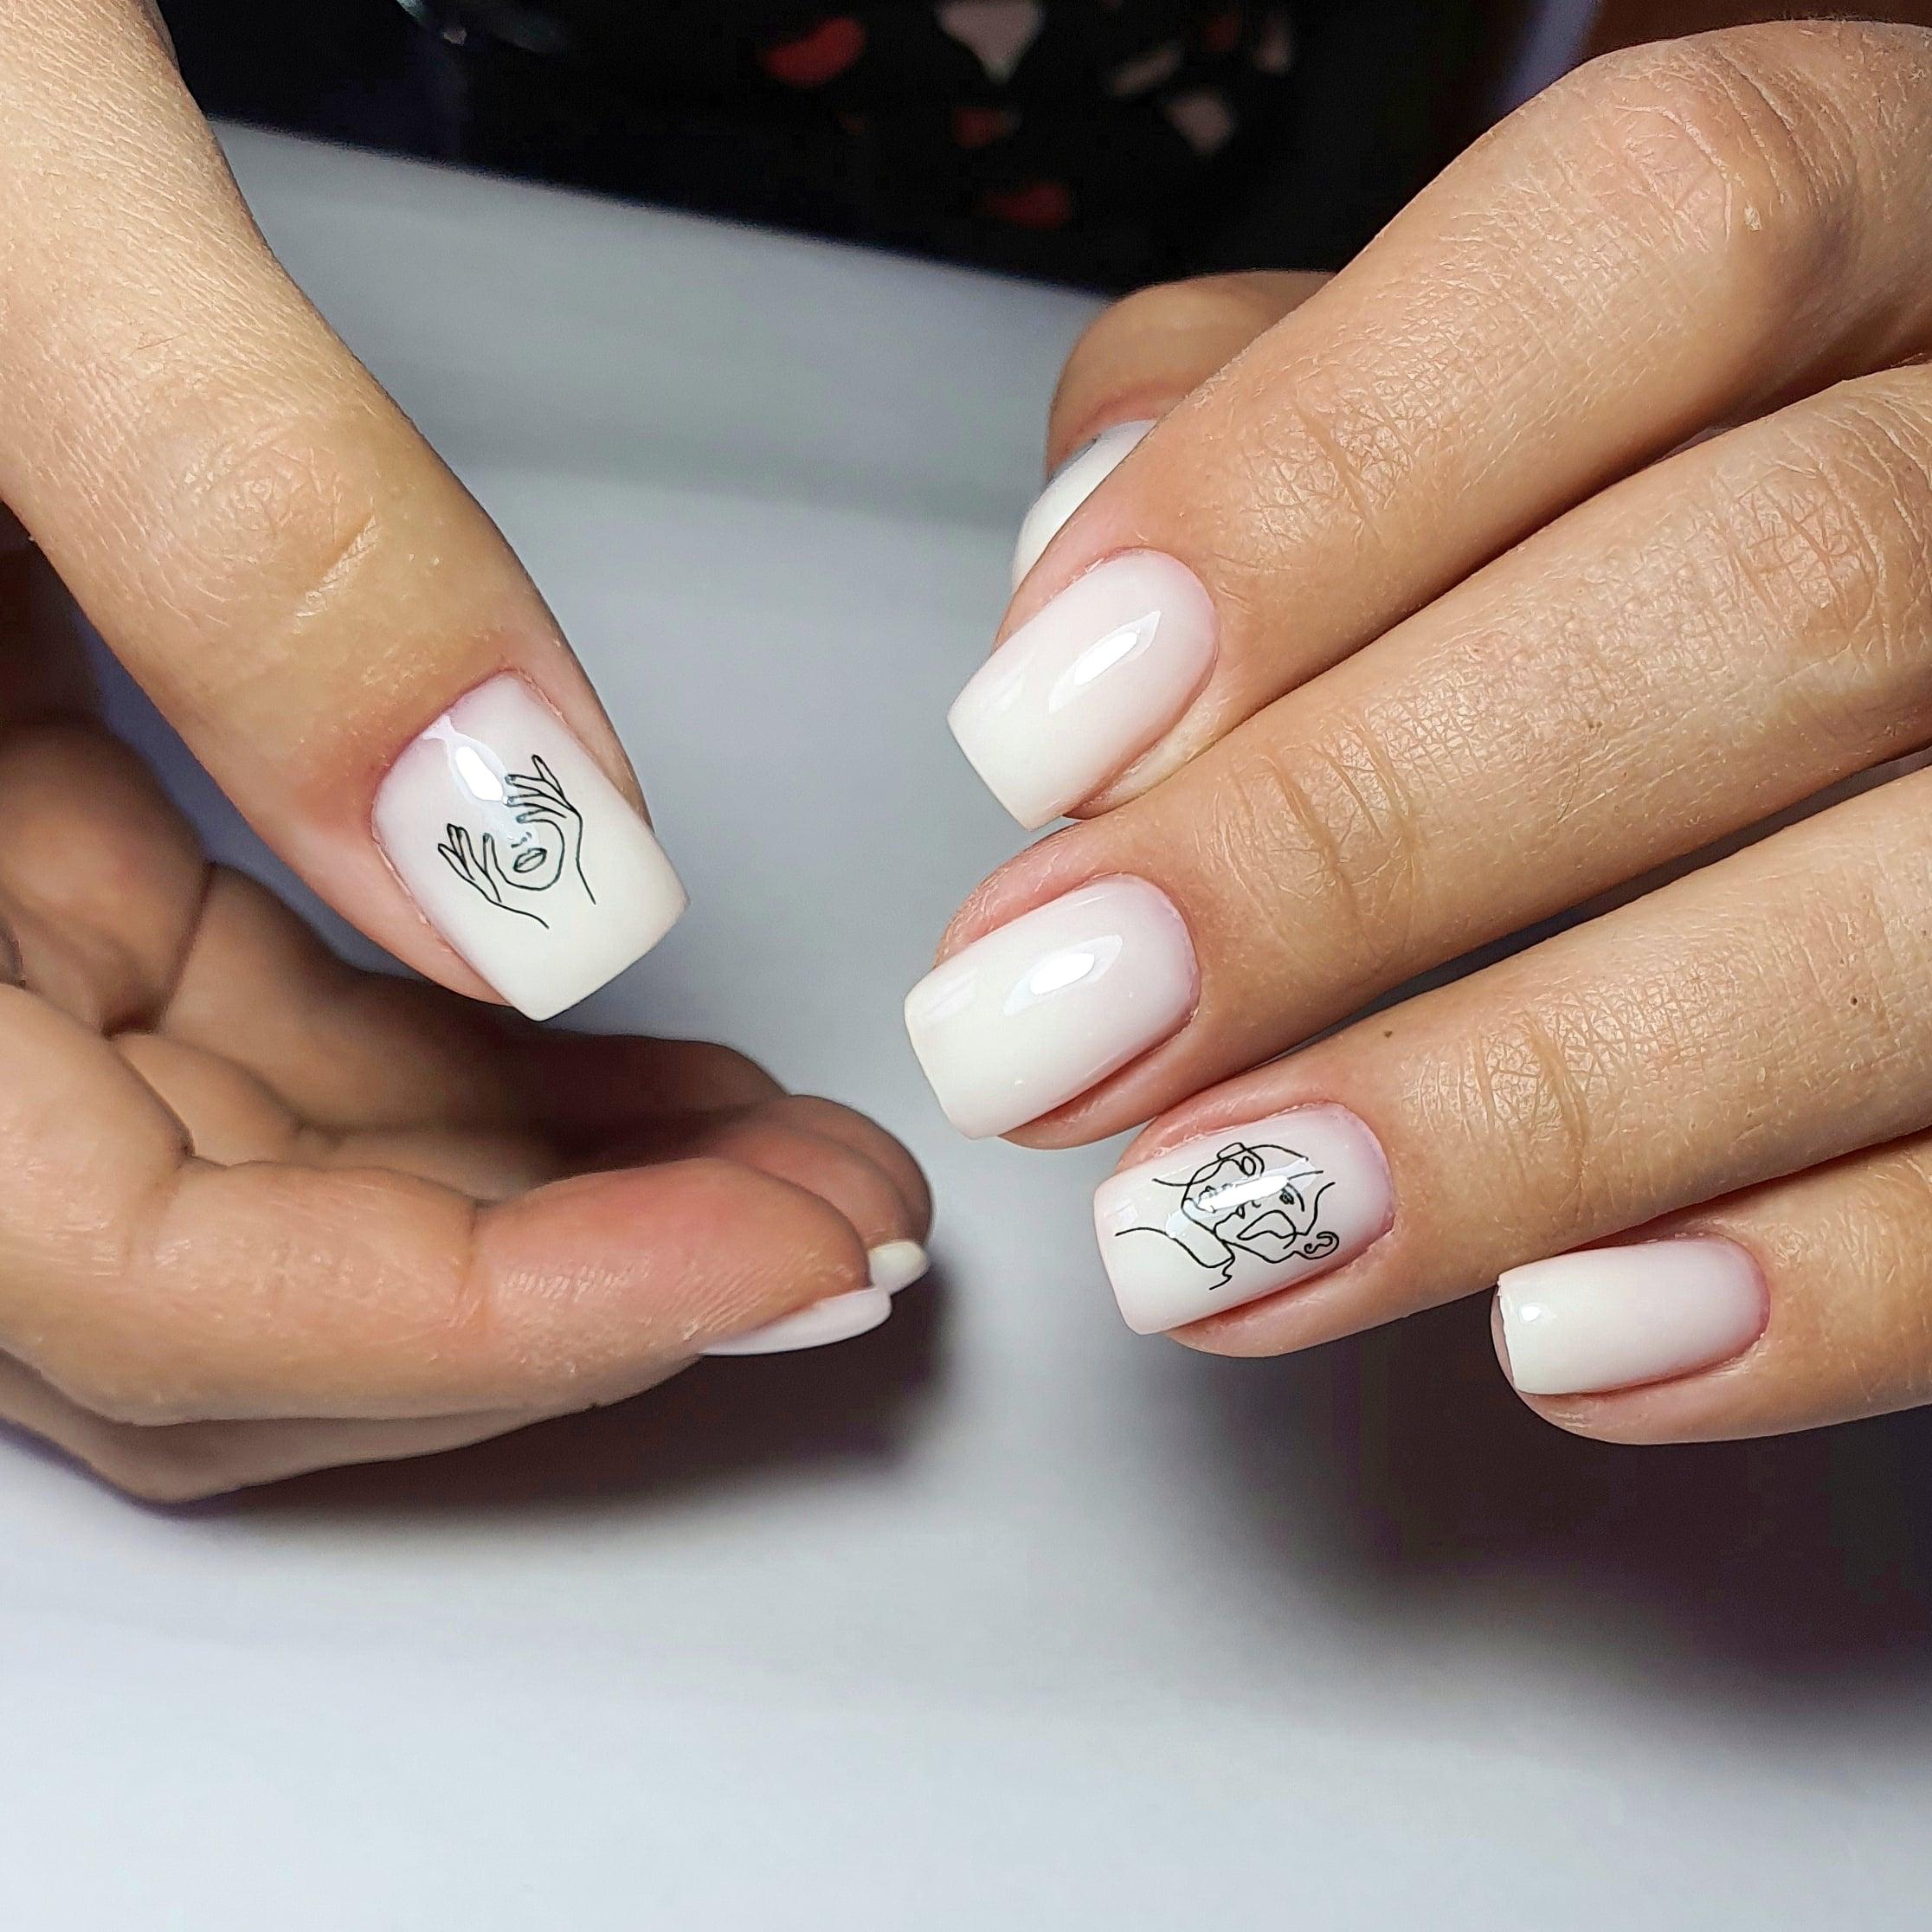 Маникюр со слайдерами в молочном цвете на короткие ногти.